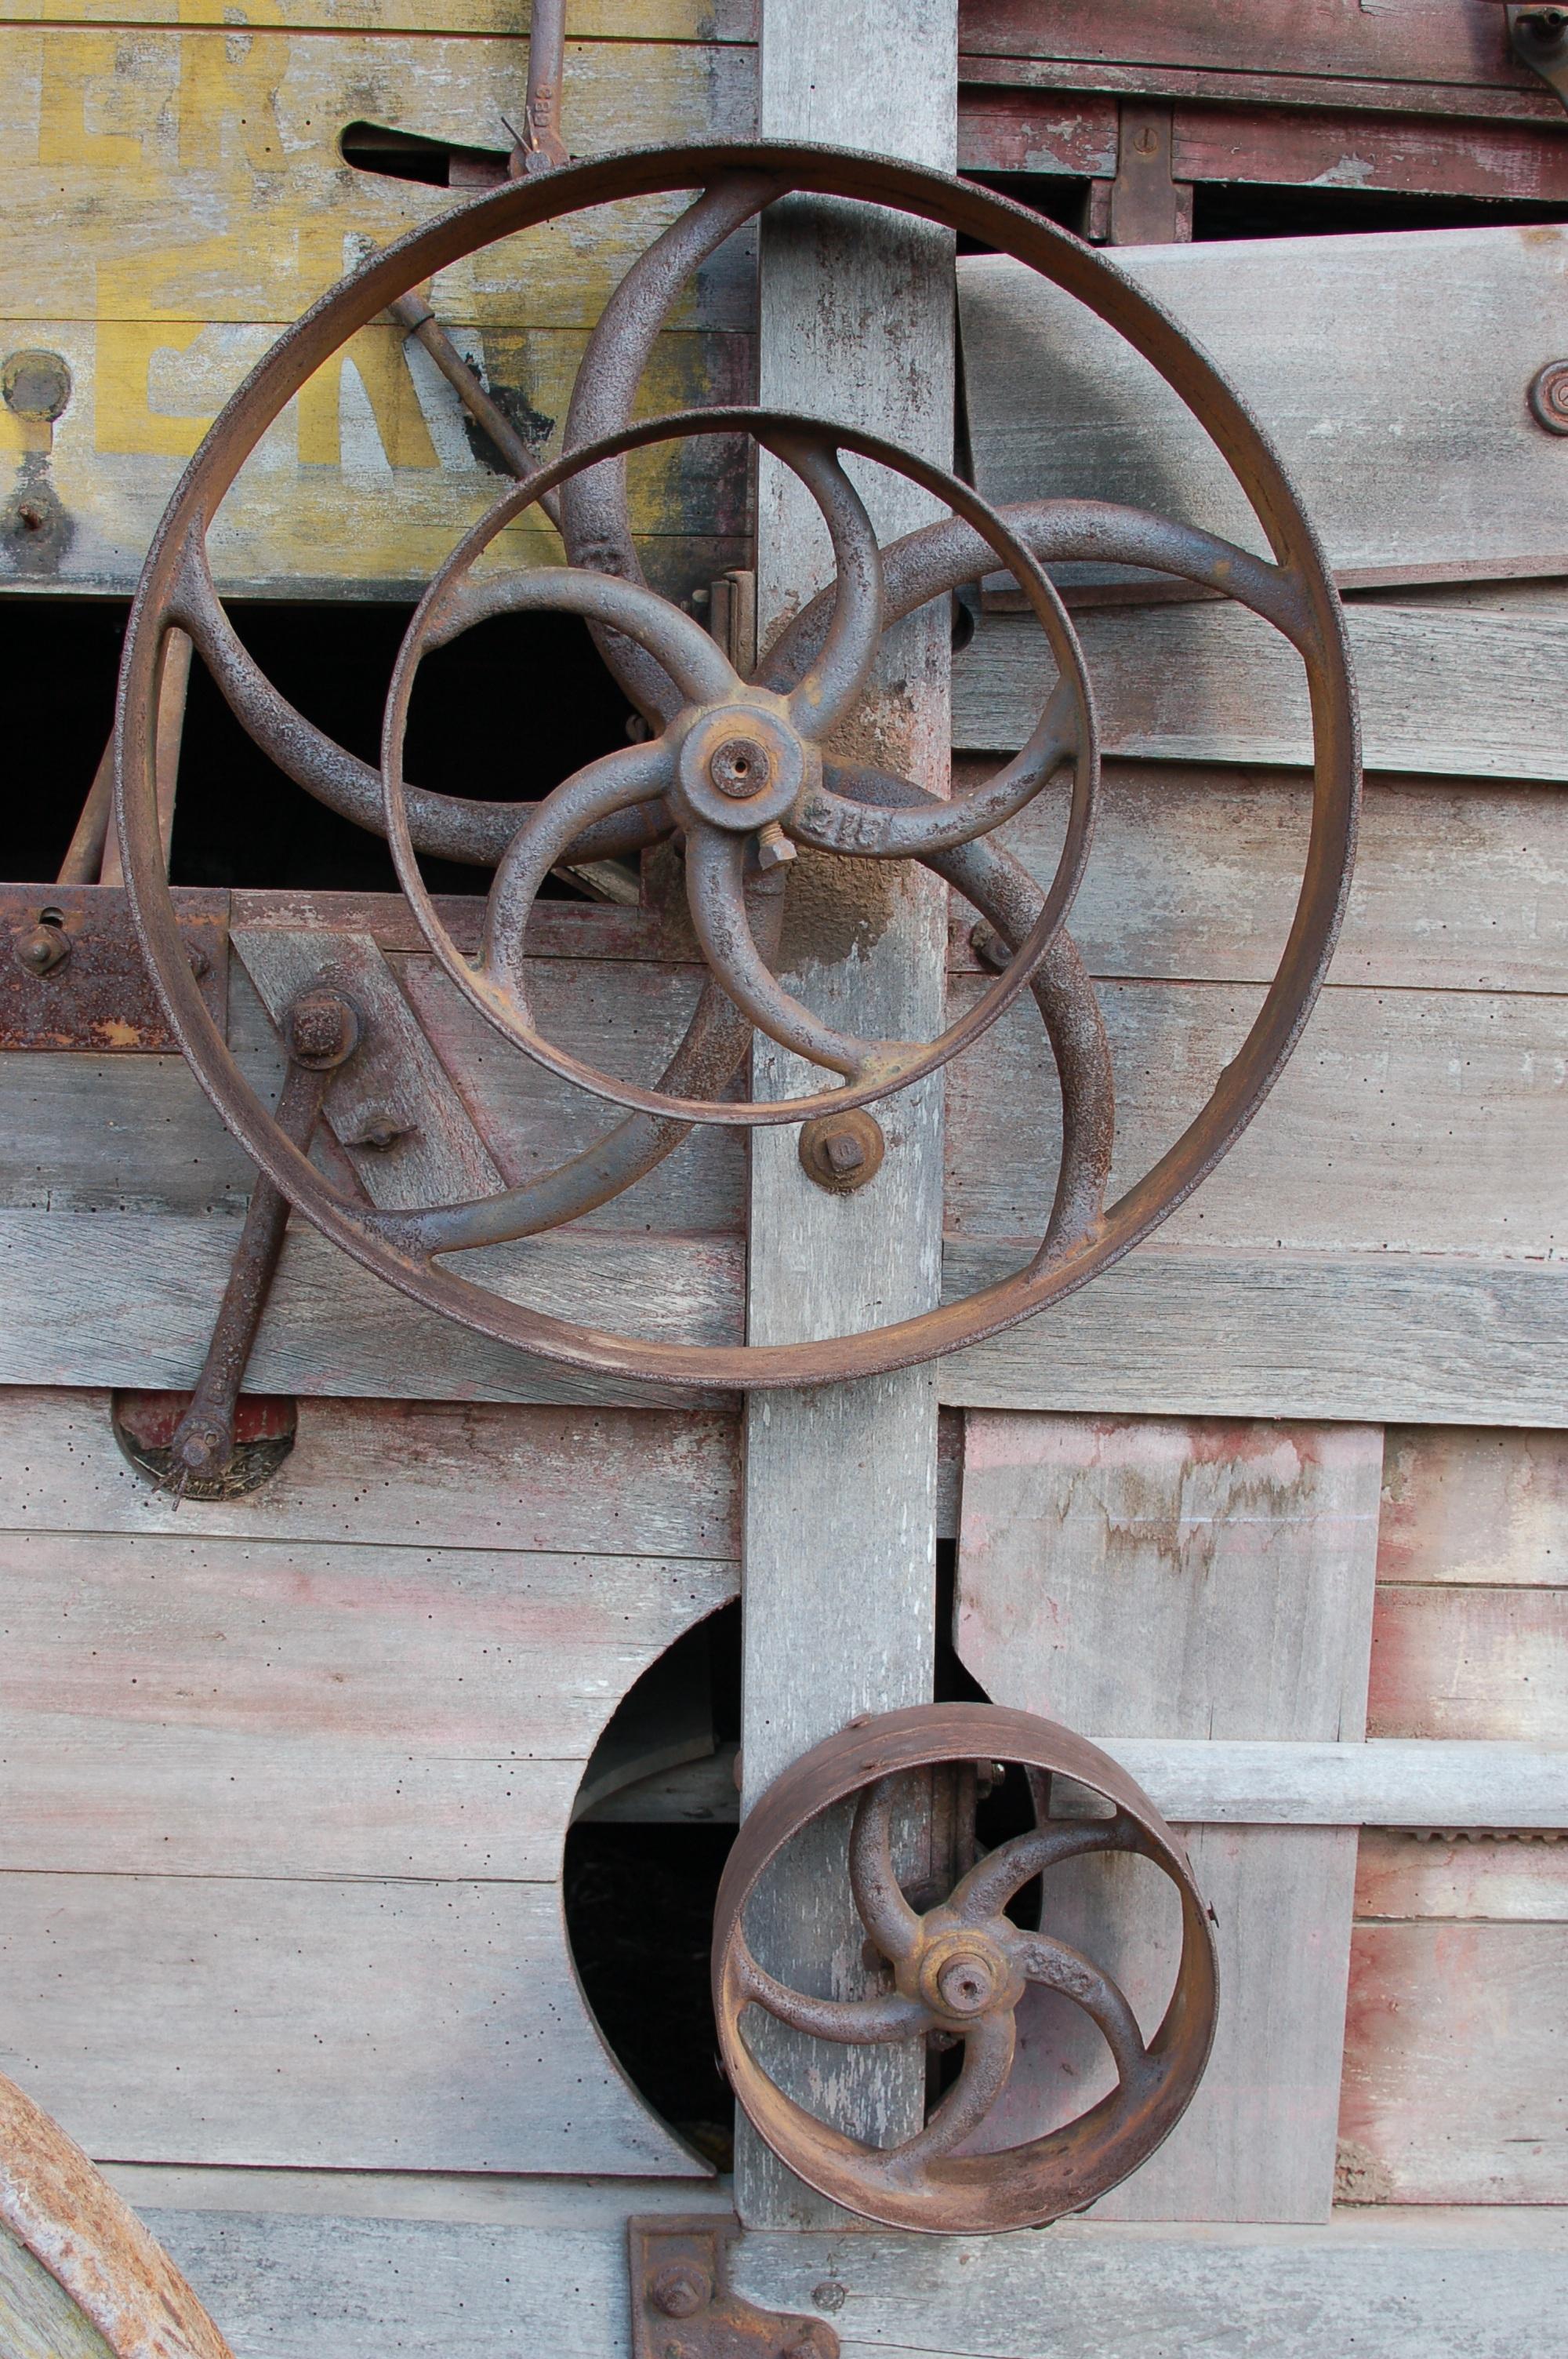 Table Wood Vintage Antique Wheel Wagon Vehicle Gear Metal Furniture Cog  Sculpture Art Iron Carving Man